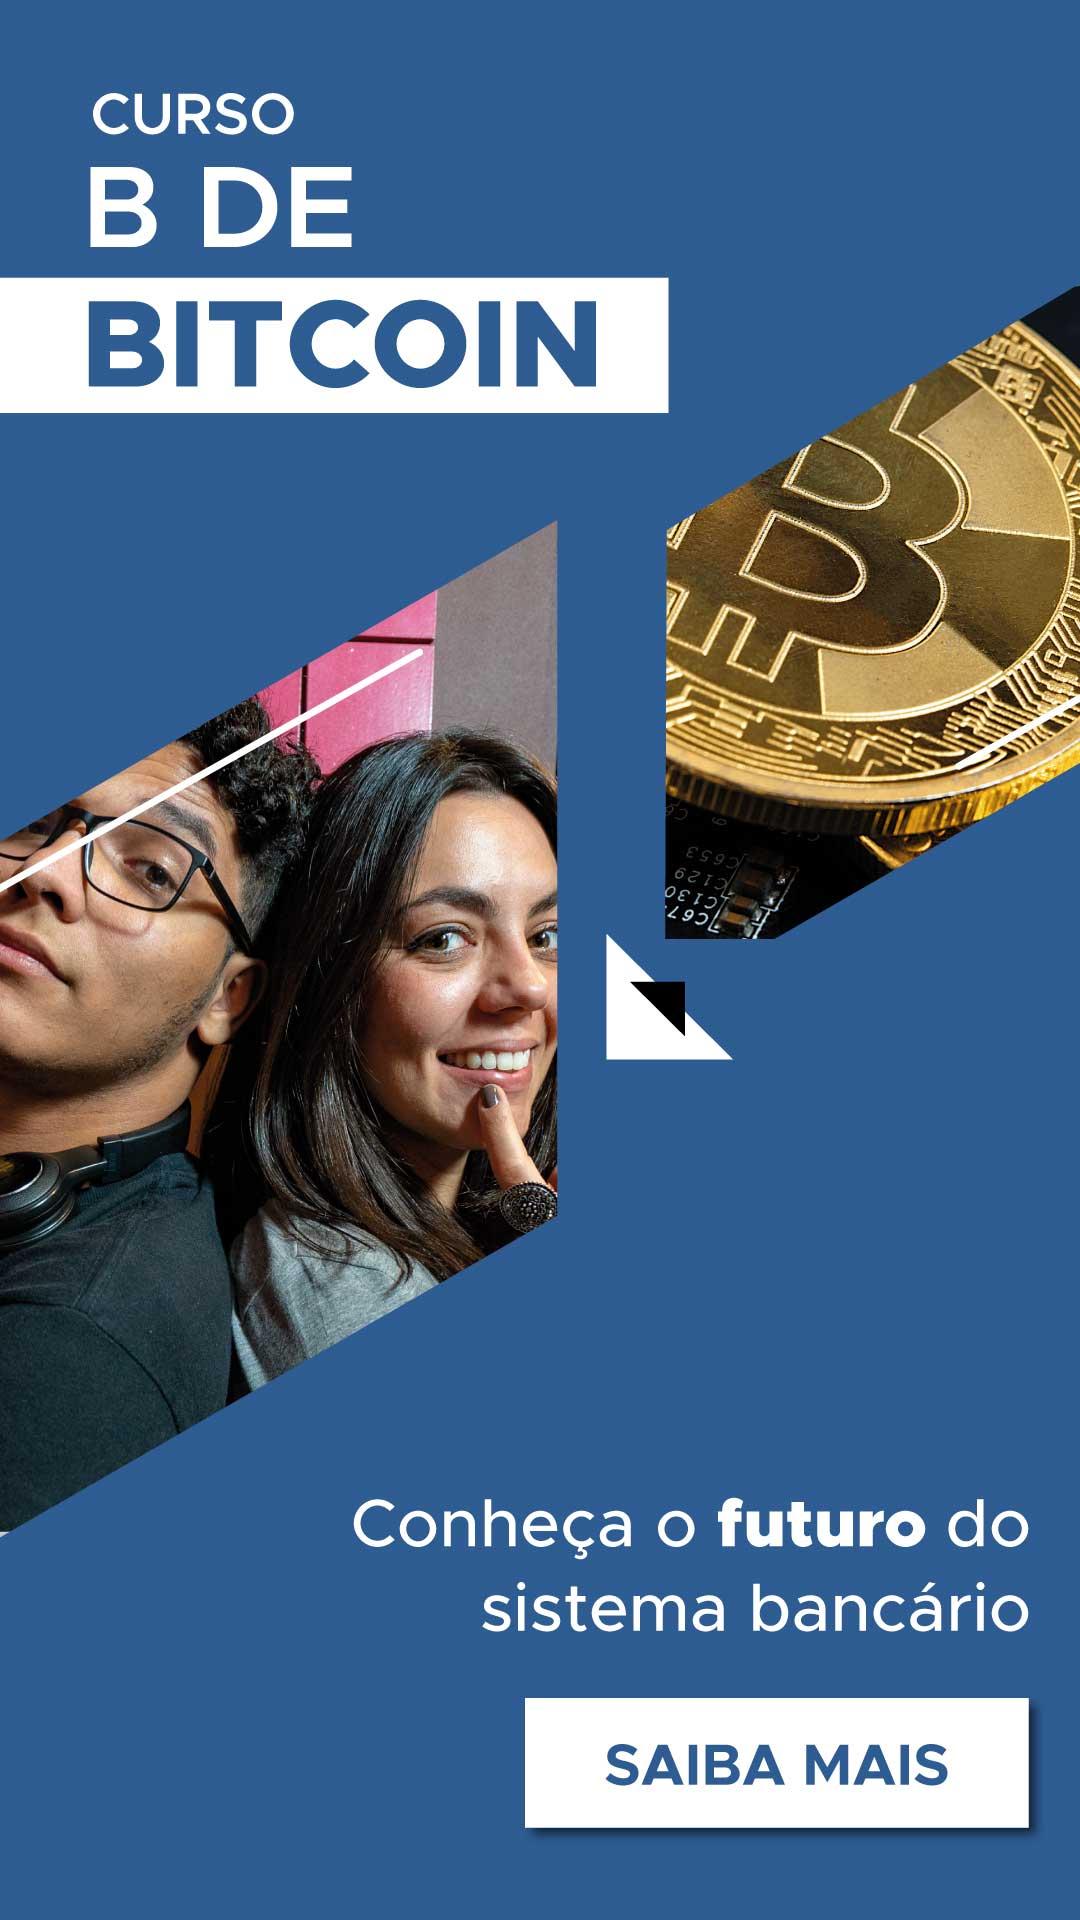 B de bitcoin - Curso Foxbit Lab